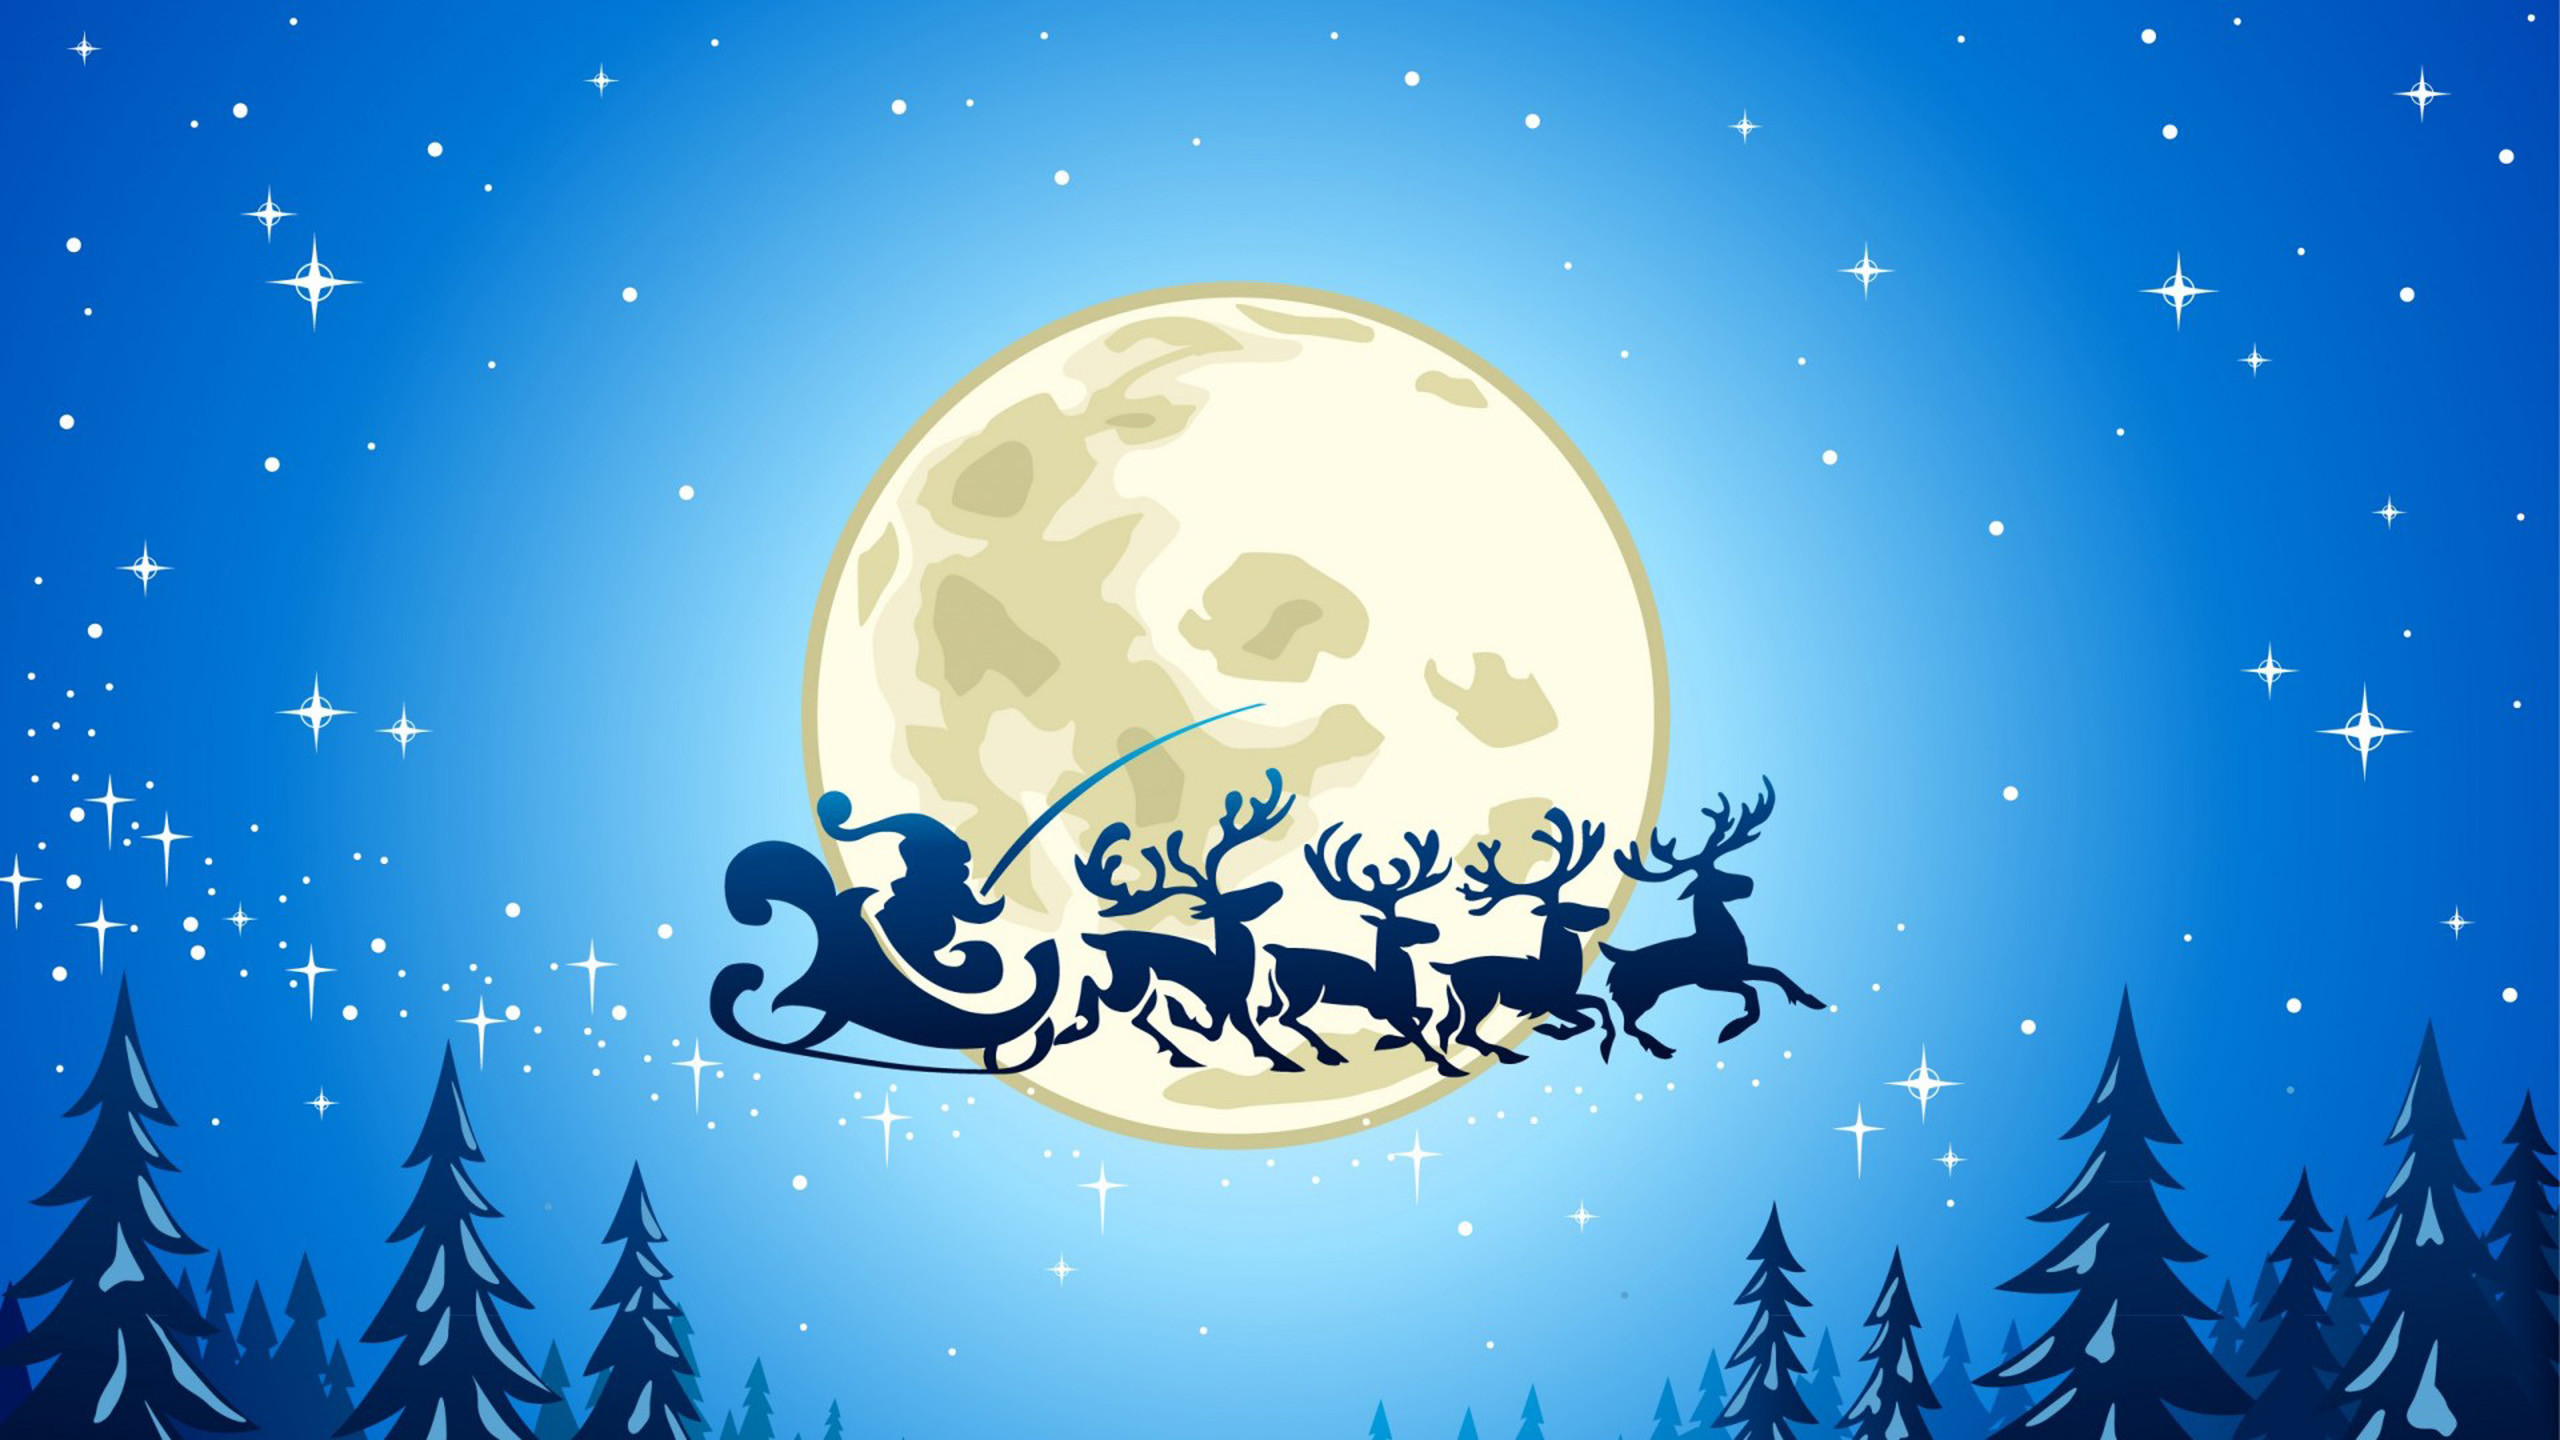 0 Winter Holidays Hd Desktop Wallpaper Free Christmas Desktop Background Christmas Themes Hd 2560x1440 Wallpaper Teahub Io